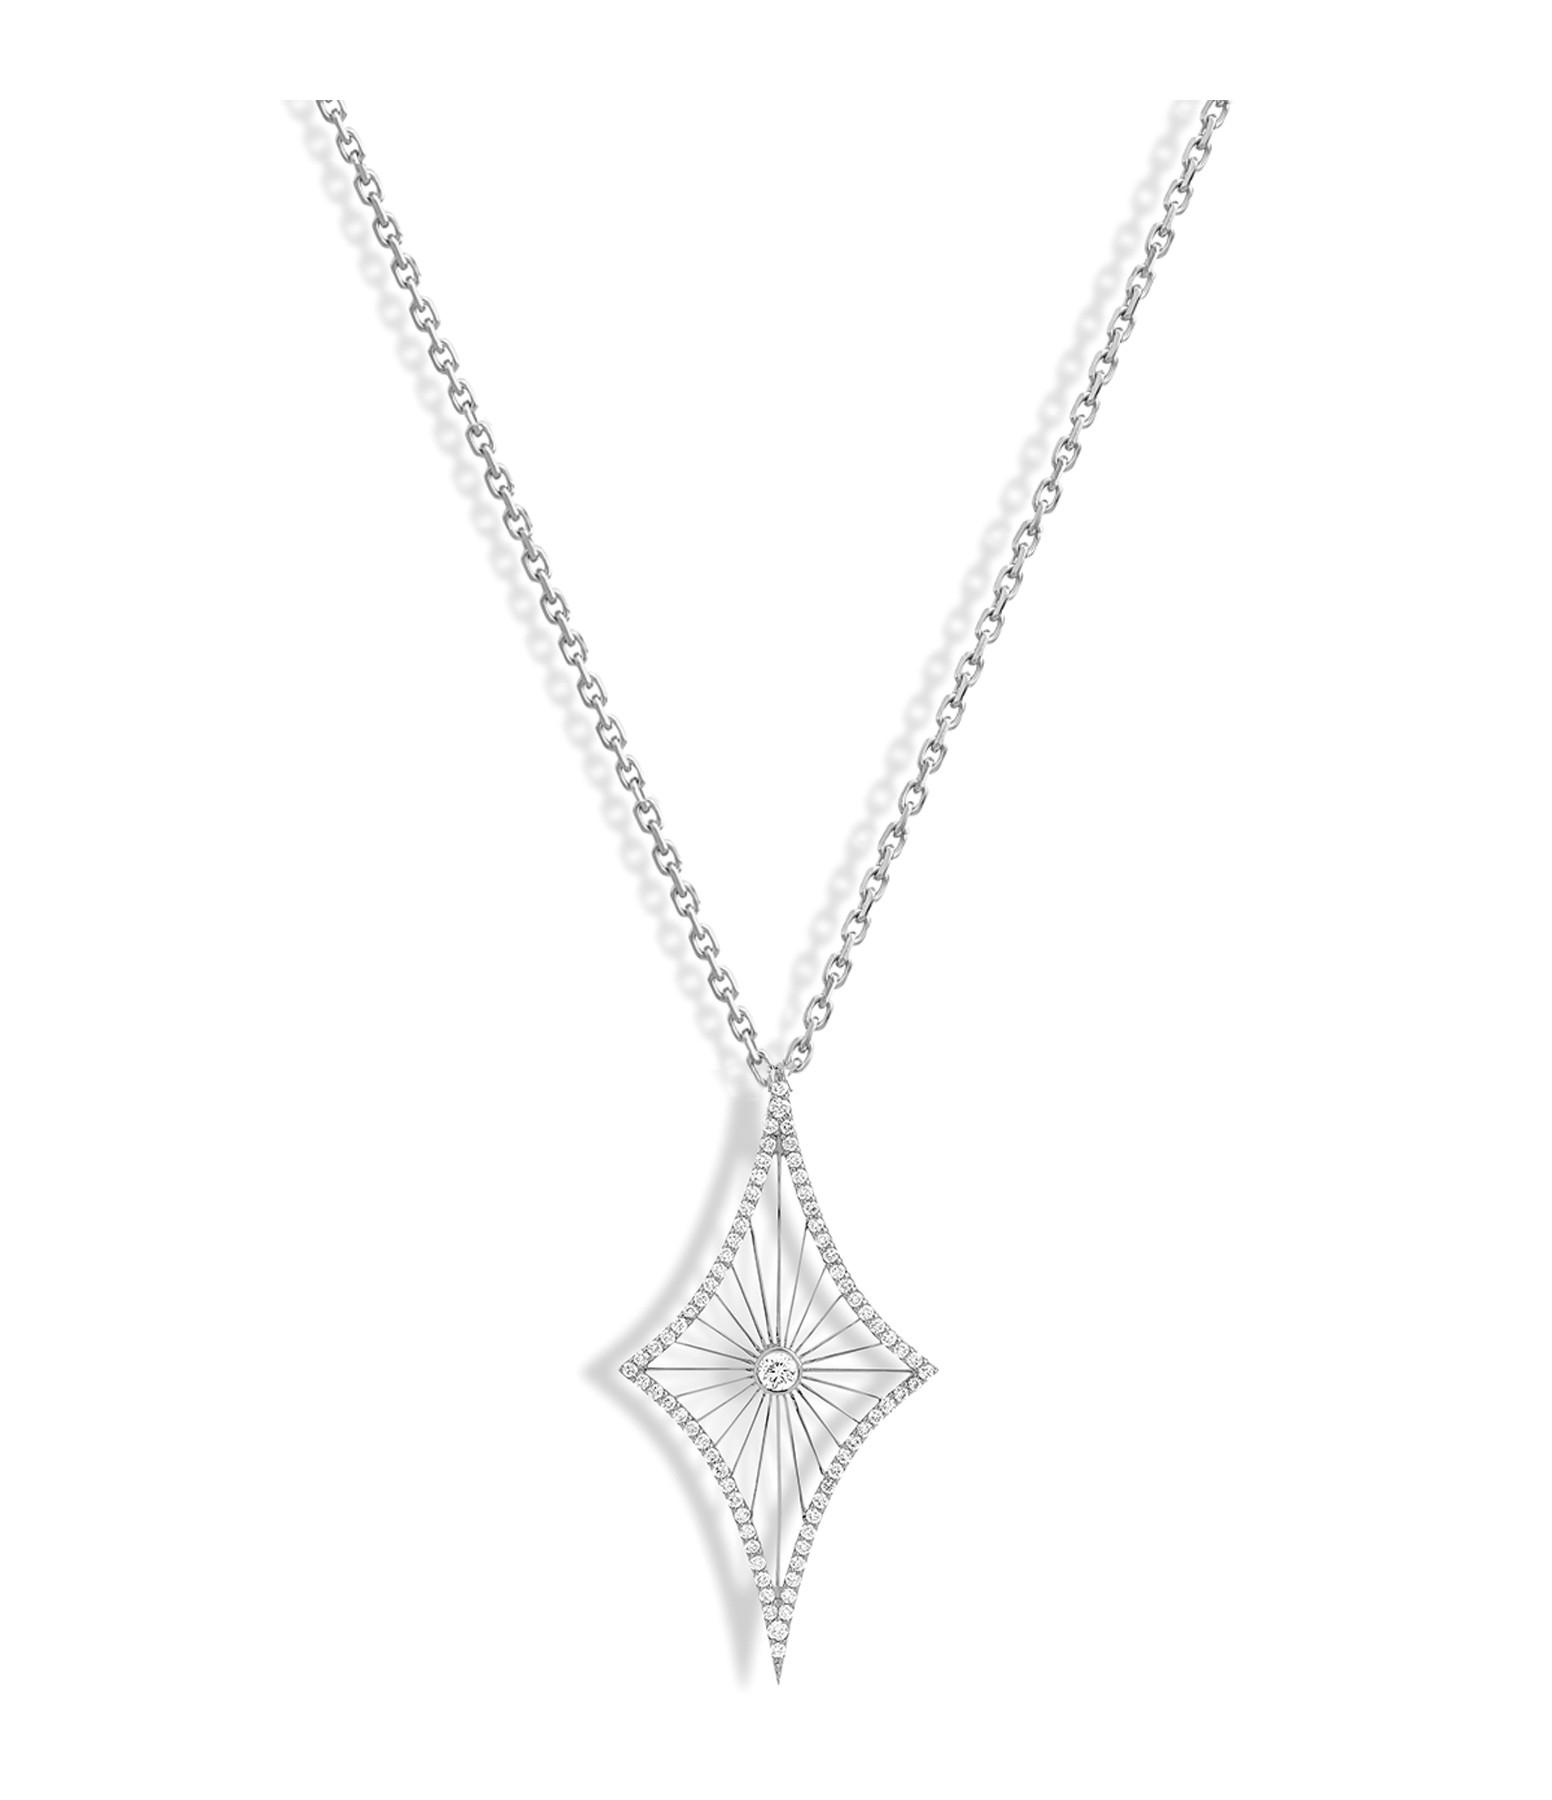 NAVA JOAILLERIE - Sautoir Cheyenne Losange Diamants Or Blanc